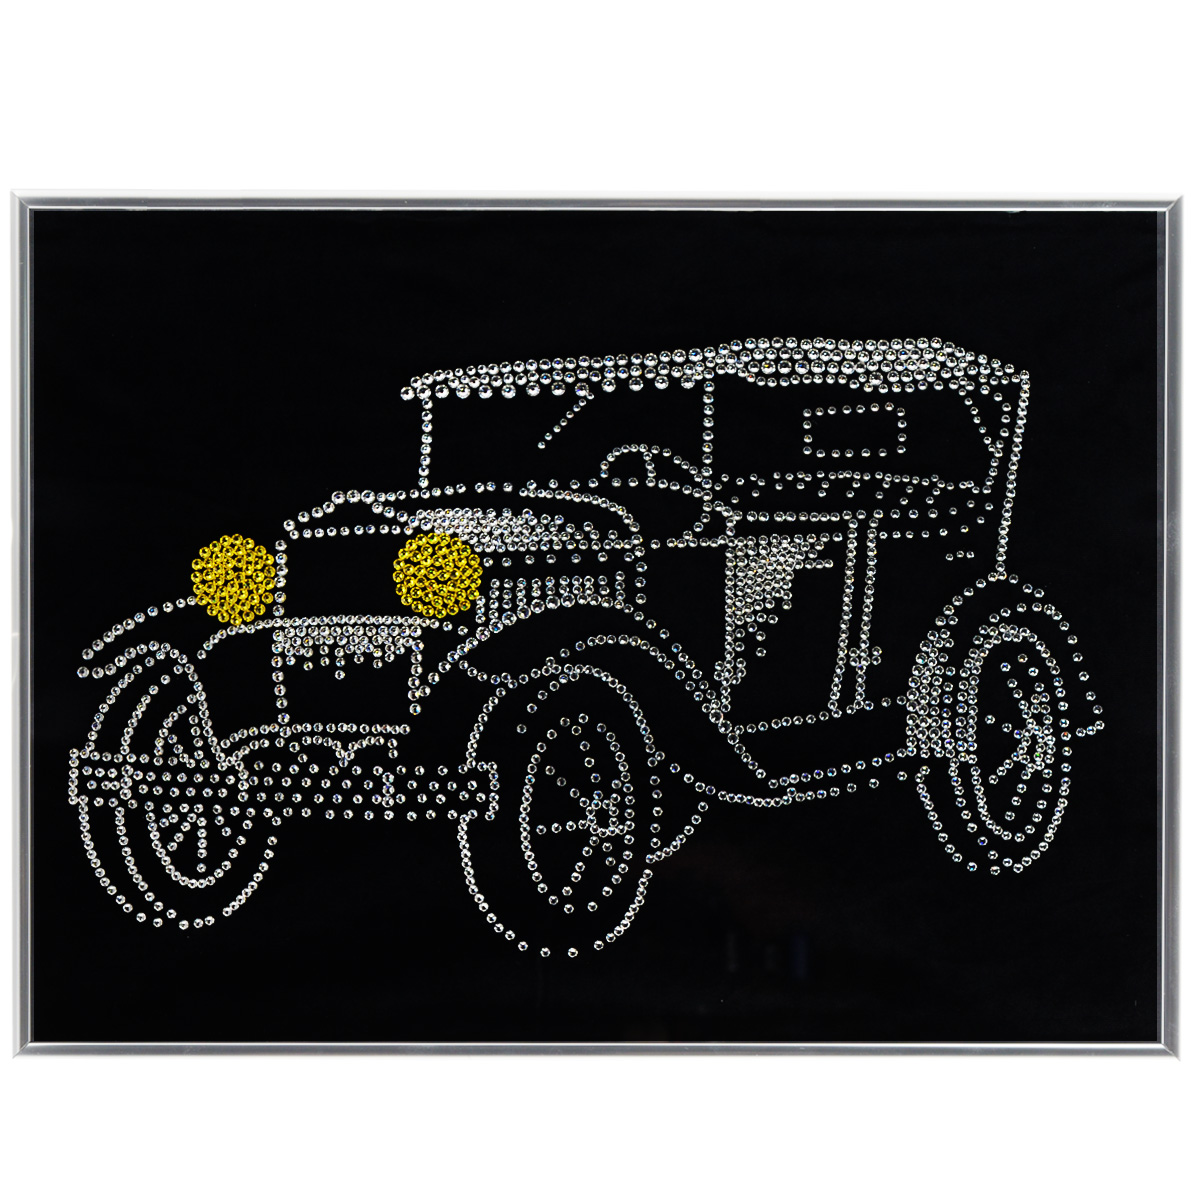 Картина с кристаллами Swarovski Ретроавтомобиль, 40 см х 30 см картины в квартиру картина etude 2 102х130 см